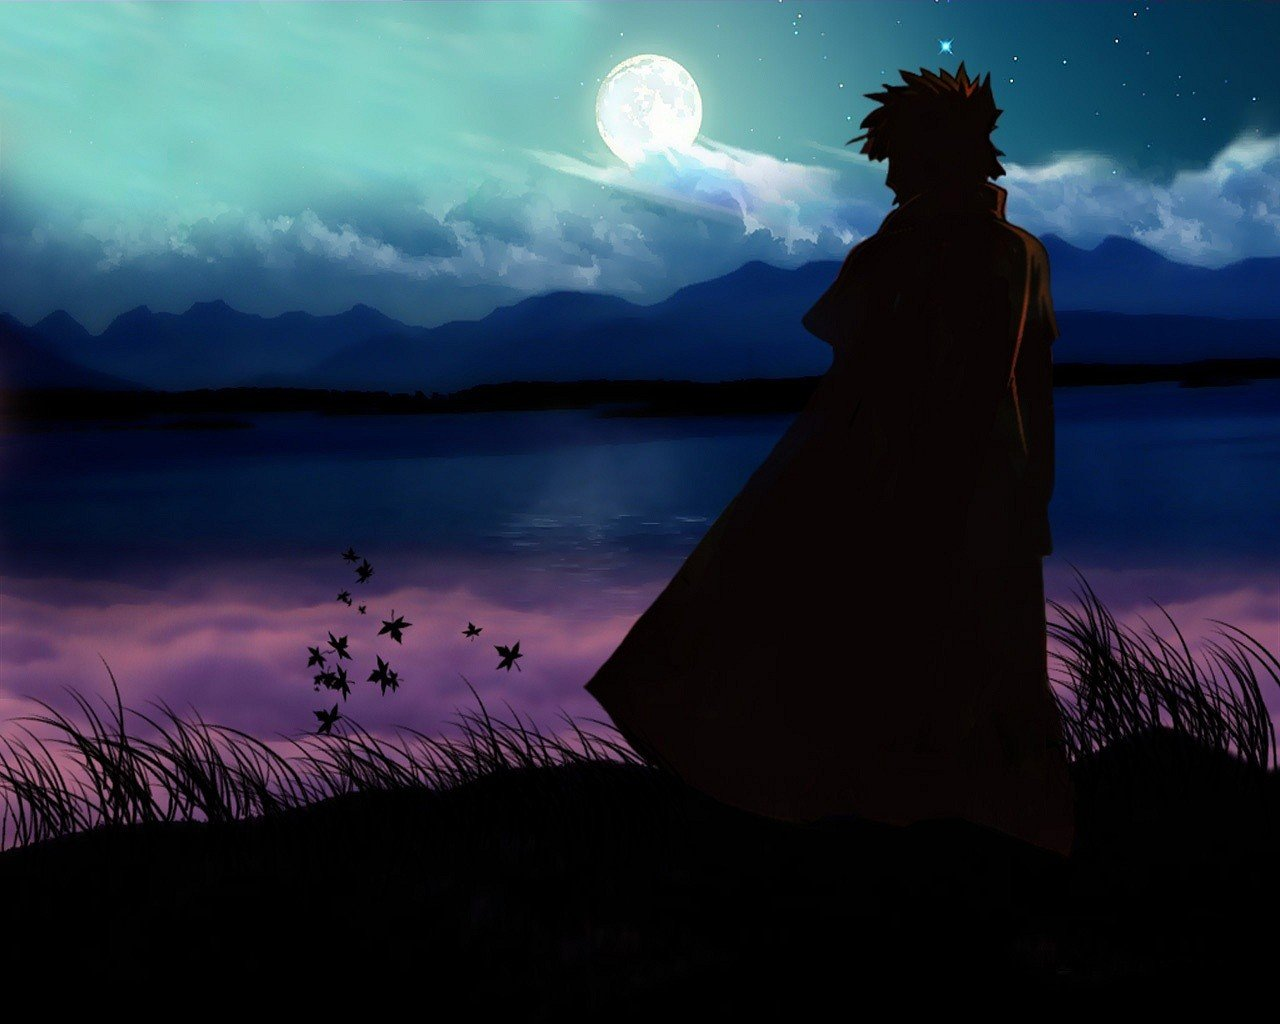 Top Wallpaper Naruto Silhouette - 85373-Naruto_Shippuuden-manga-anime-Namikaze_Minato-silhouette  2018.jpg